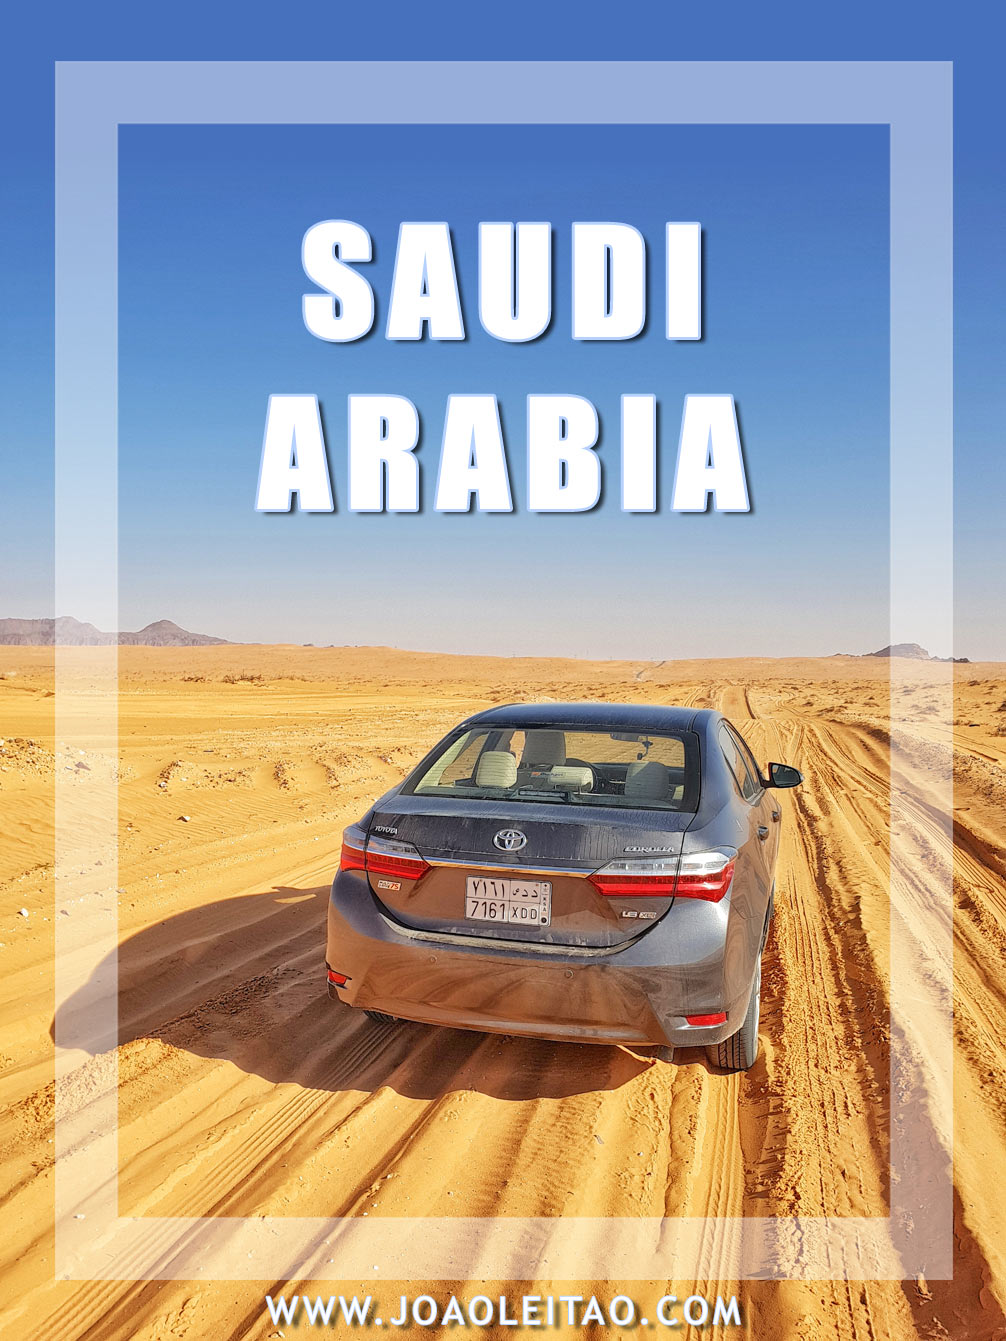 Driving in Saudi Arabia